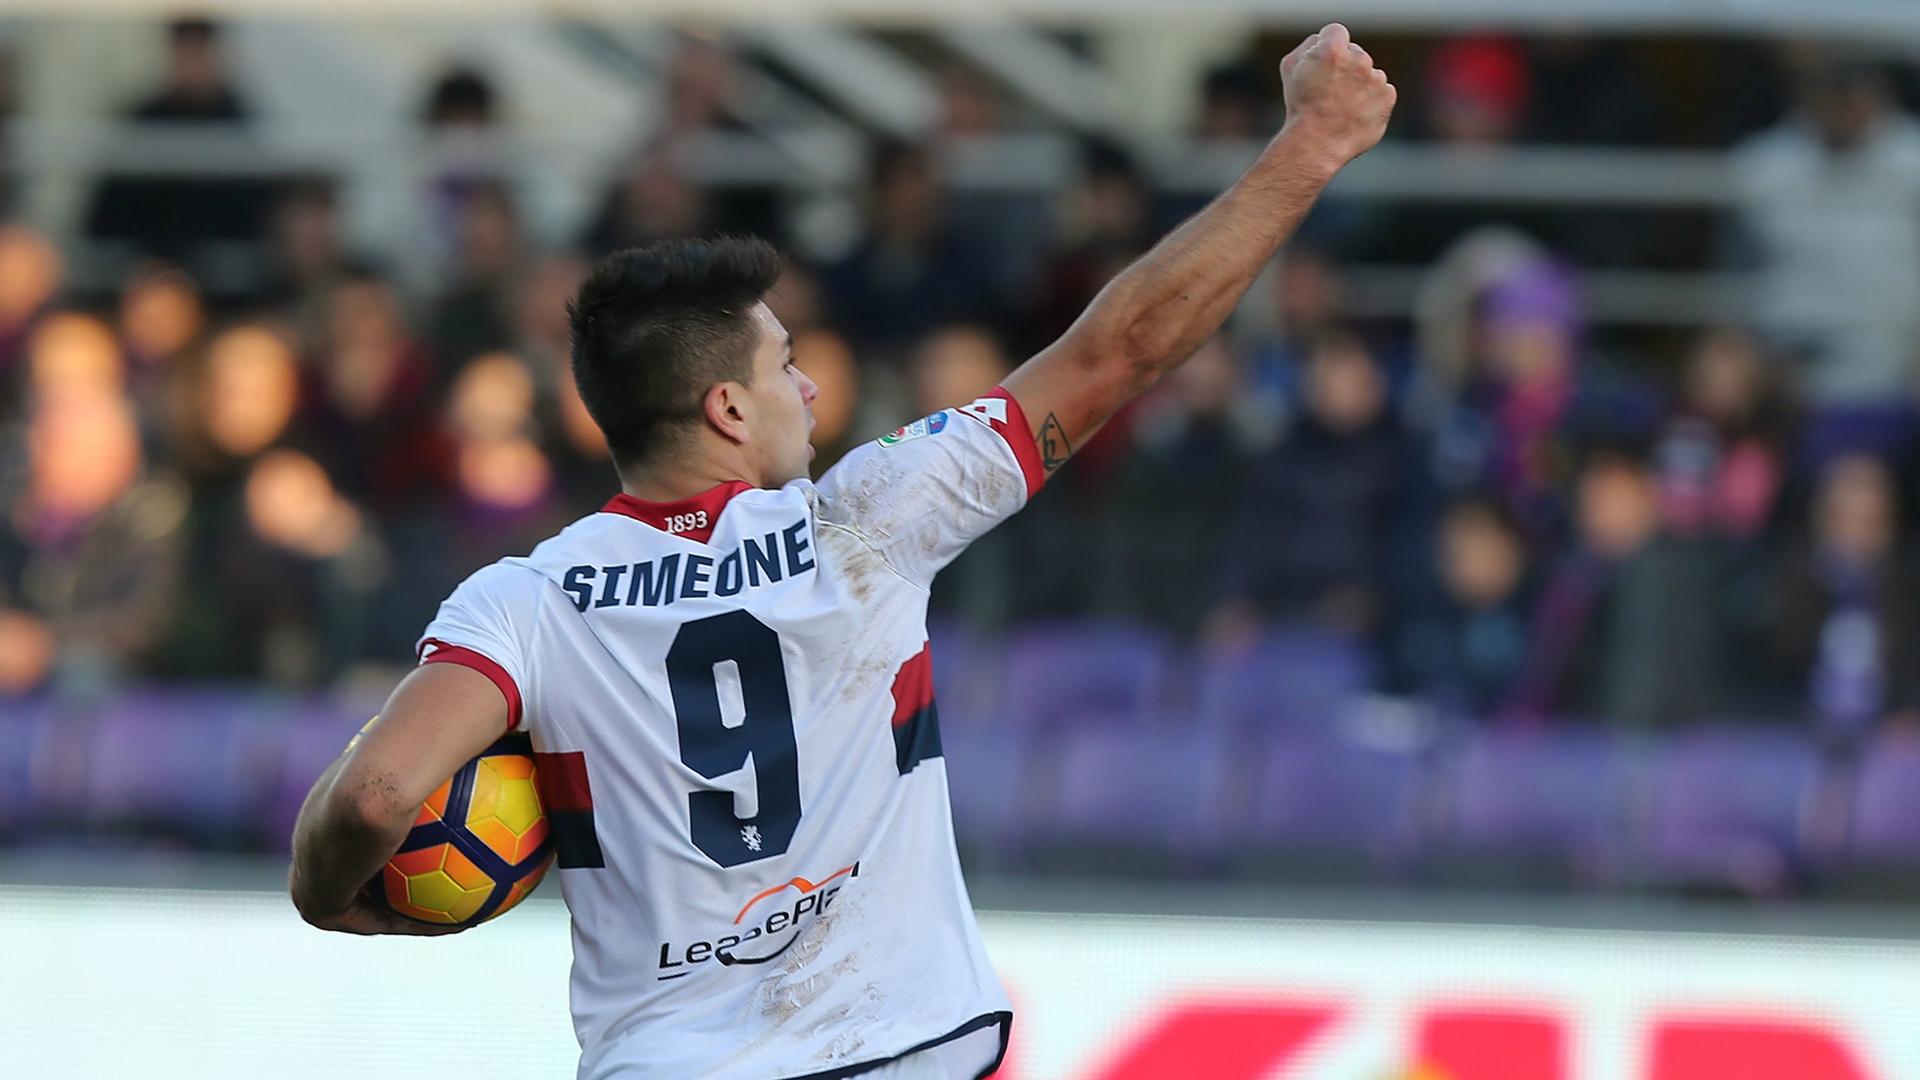 Video Gol Fiorentina-Genoa 3-3: highlights, sintesi e tabellino